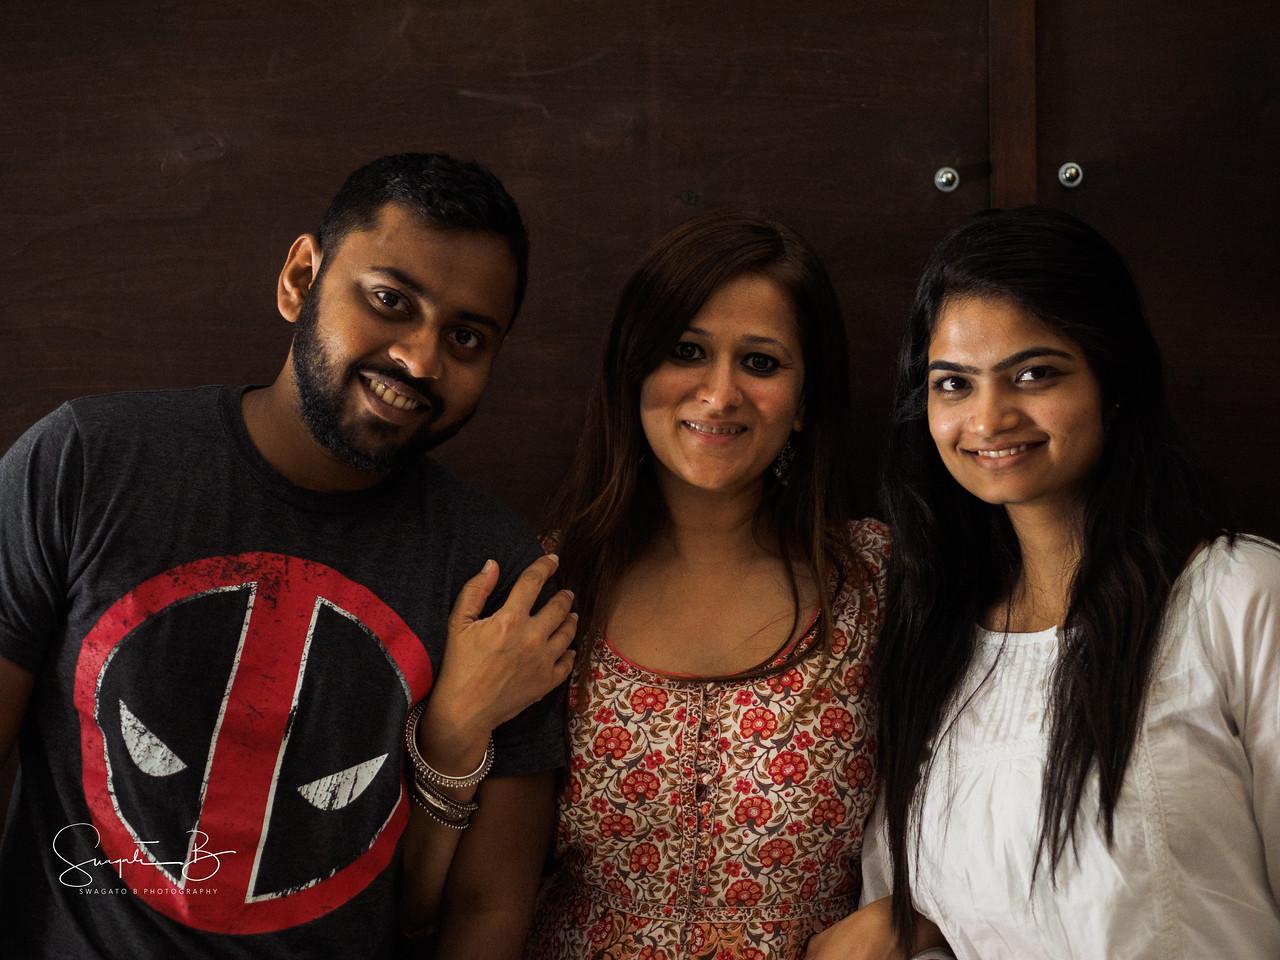 Stage Team members Chandu Subash and Purva Gaggar with Director Sindu Singh